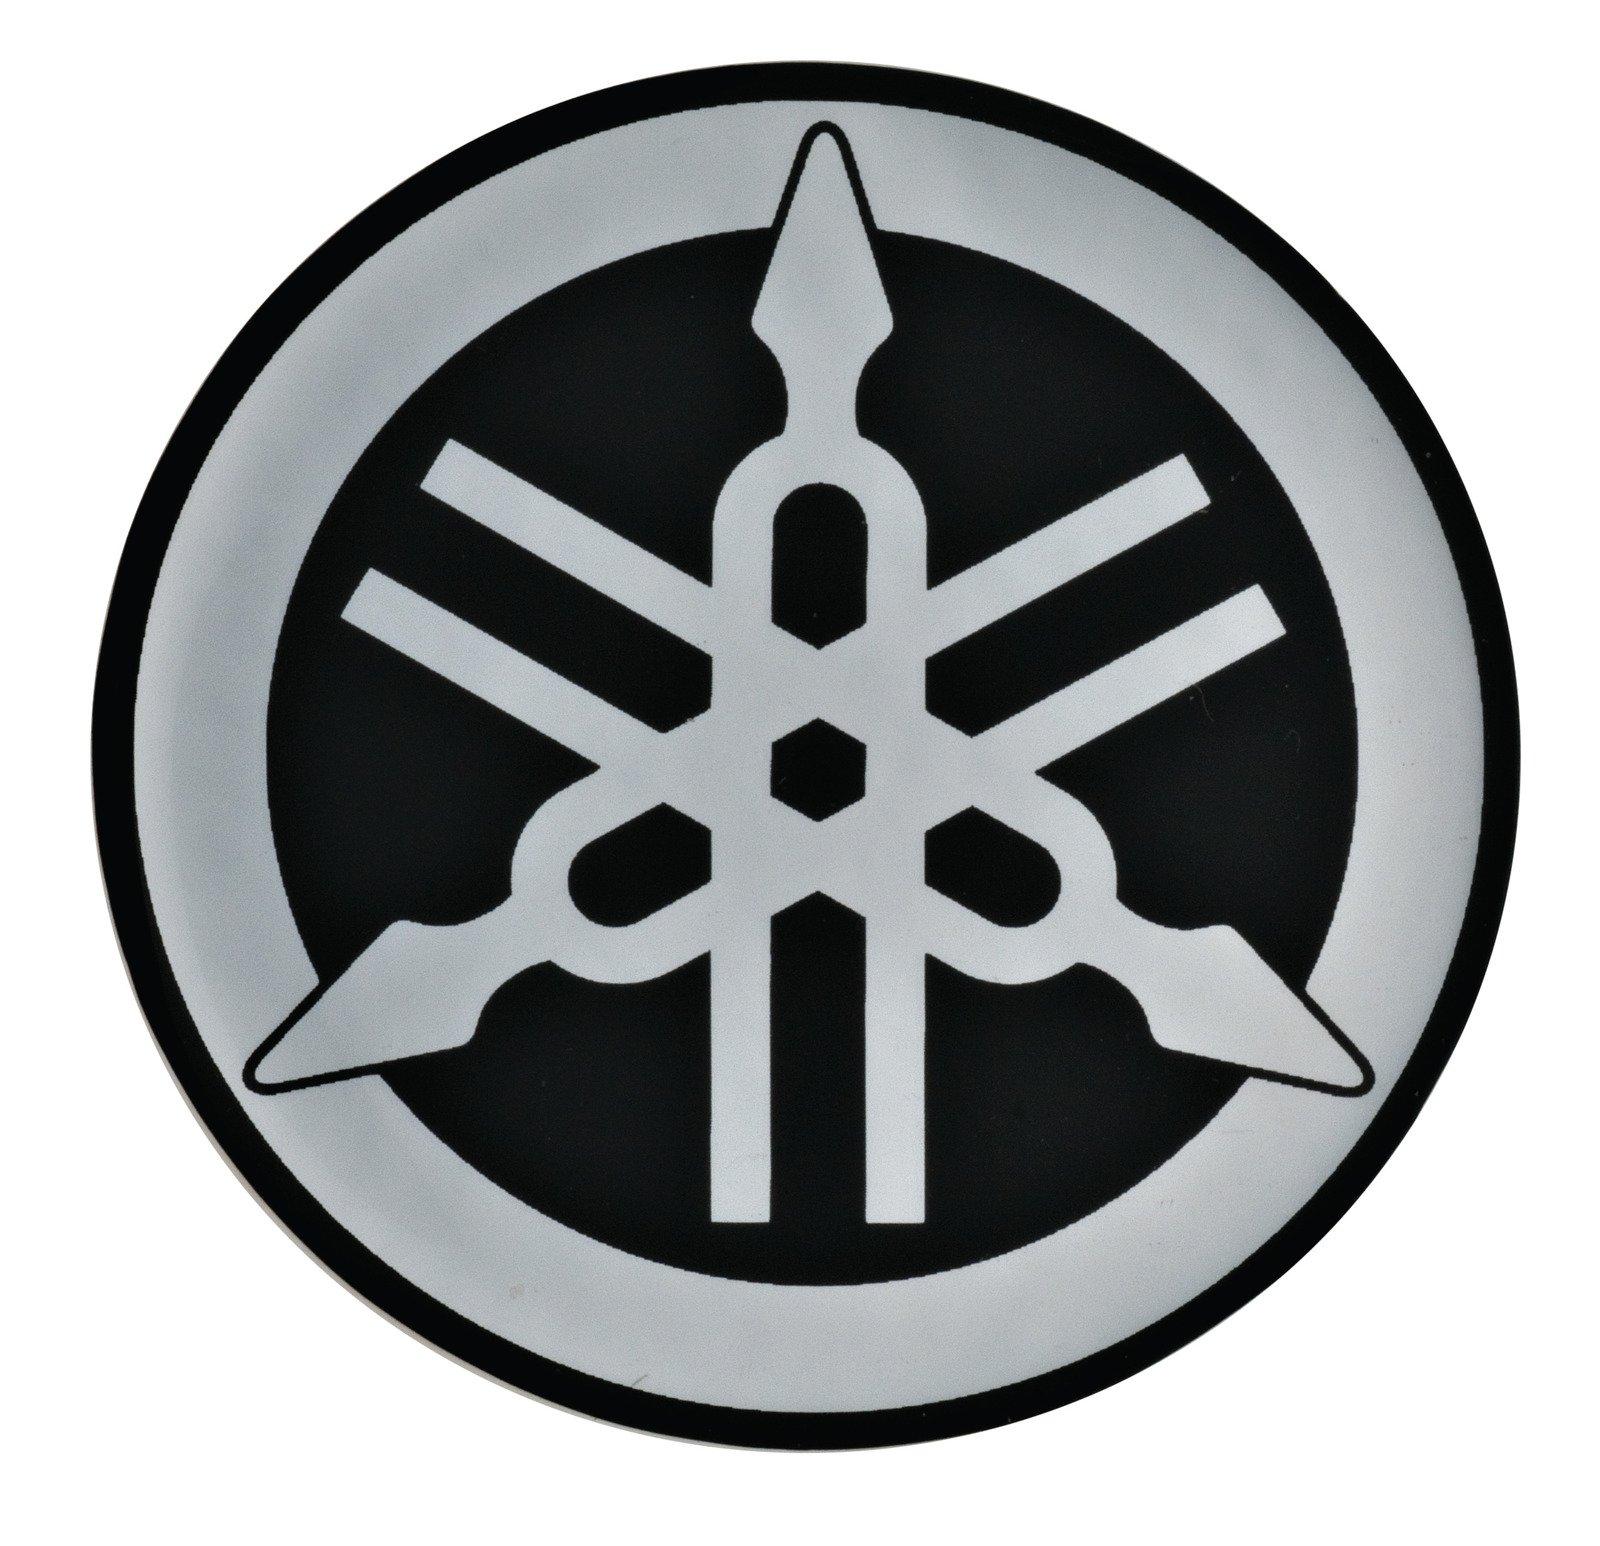 Yamaha epoxy dome diapson logo emblem decal sticker 28mm diam silver black 29165